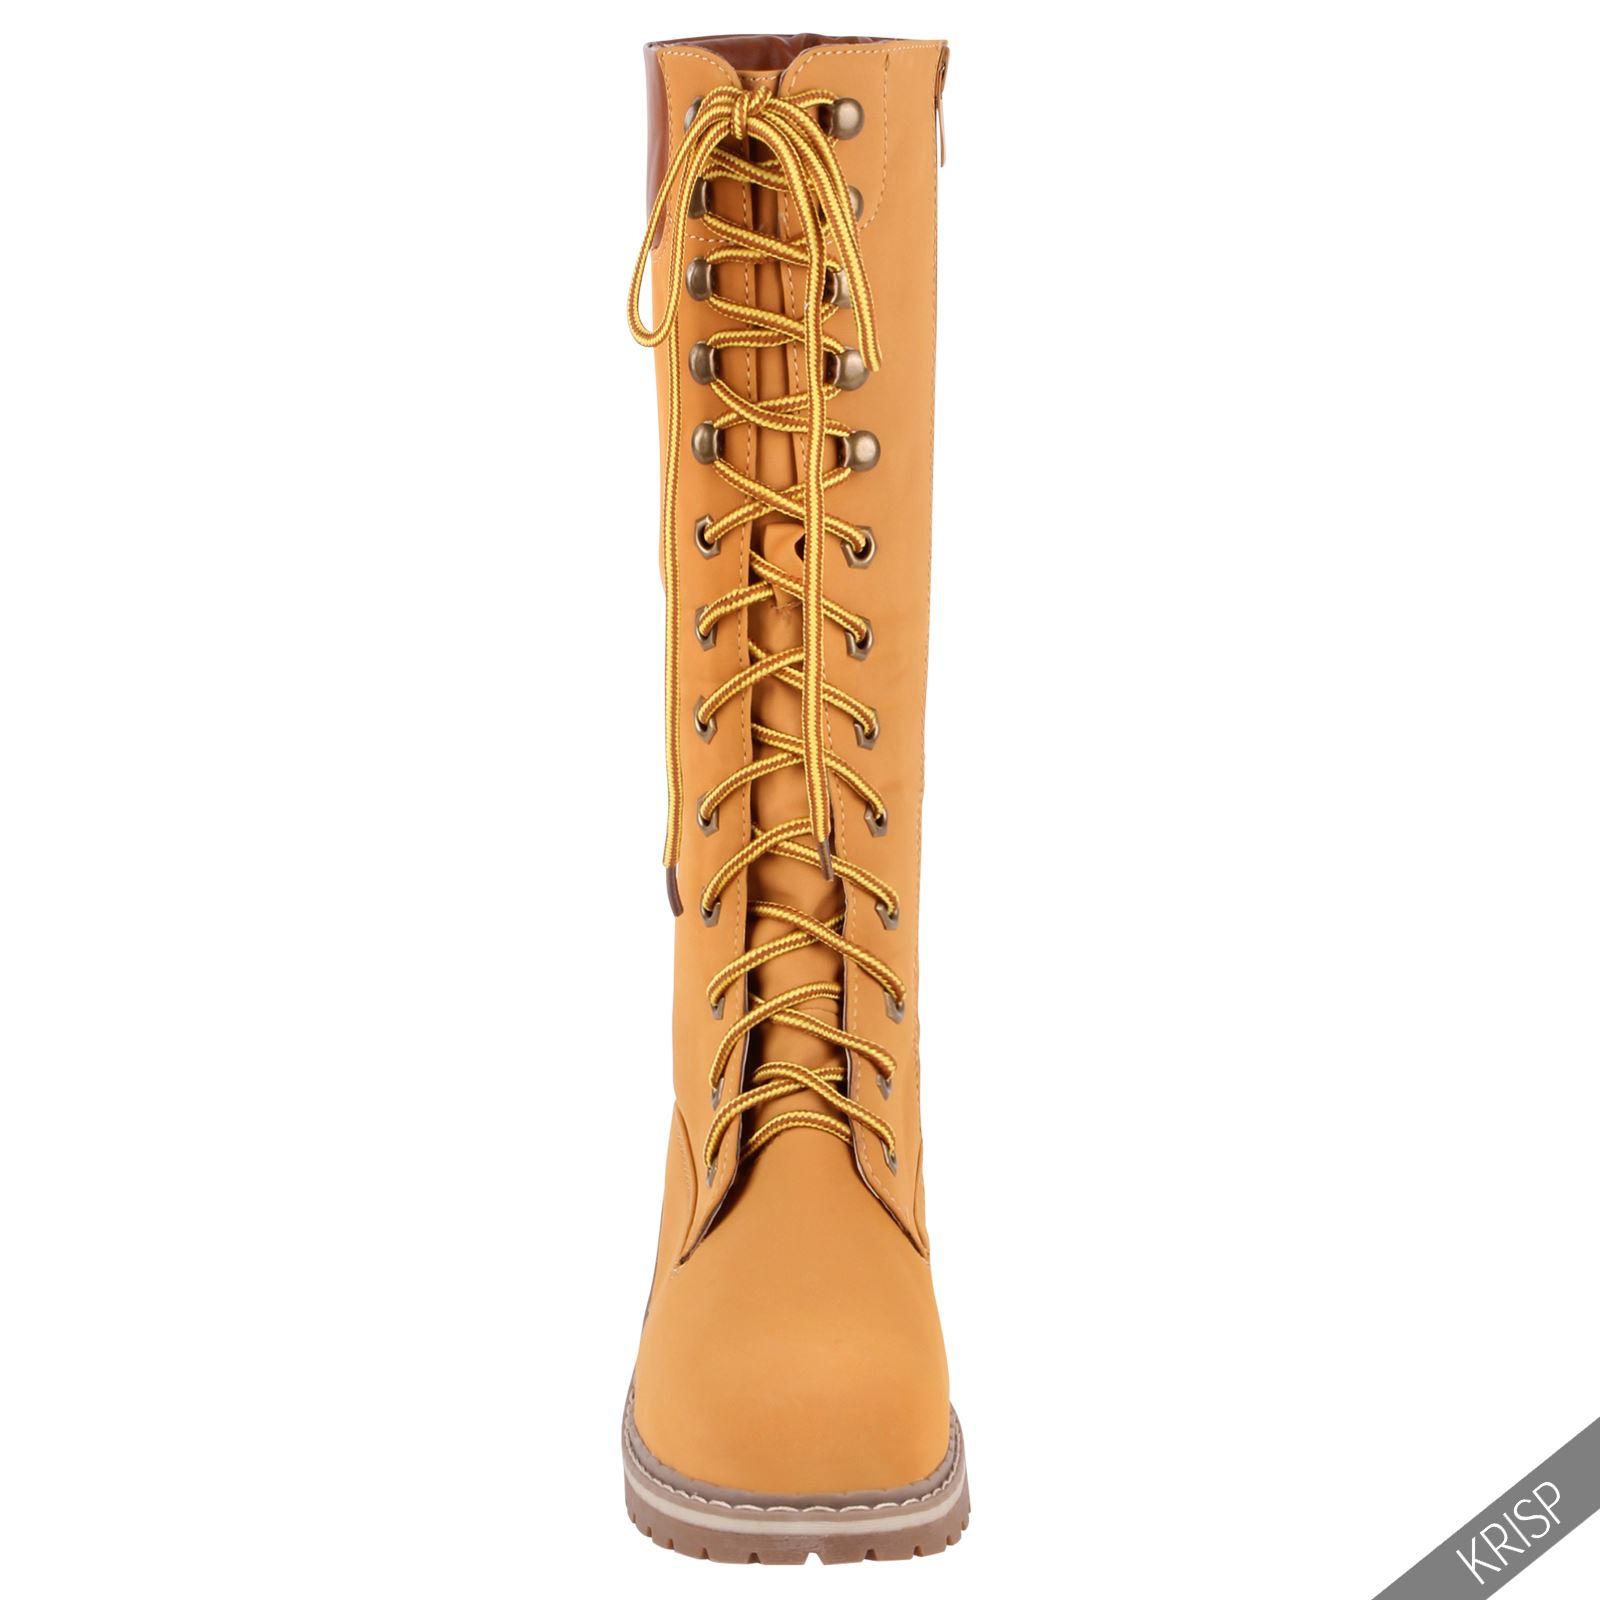 Botines-Mujer-Camel-Bota-Plana-Suela-Goma-Cordones-Casual-Otono-Invierno-Tacon miniatura 17